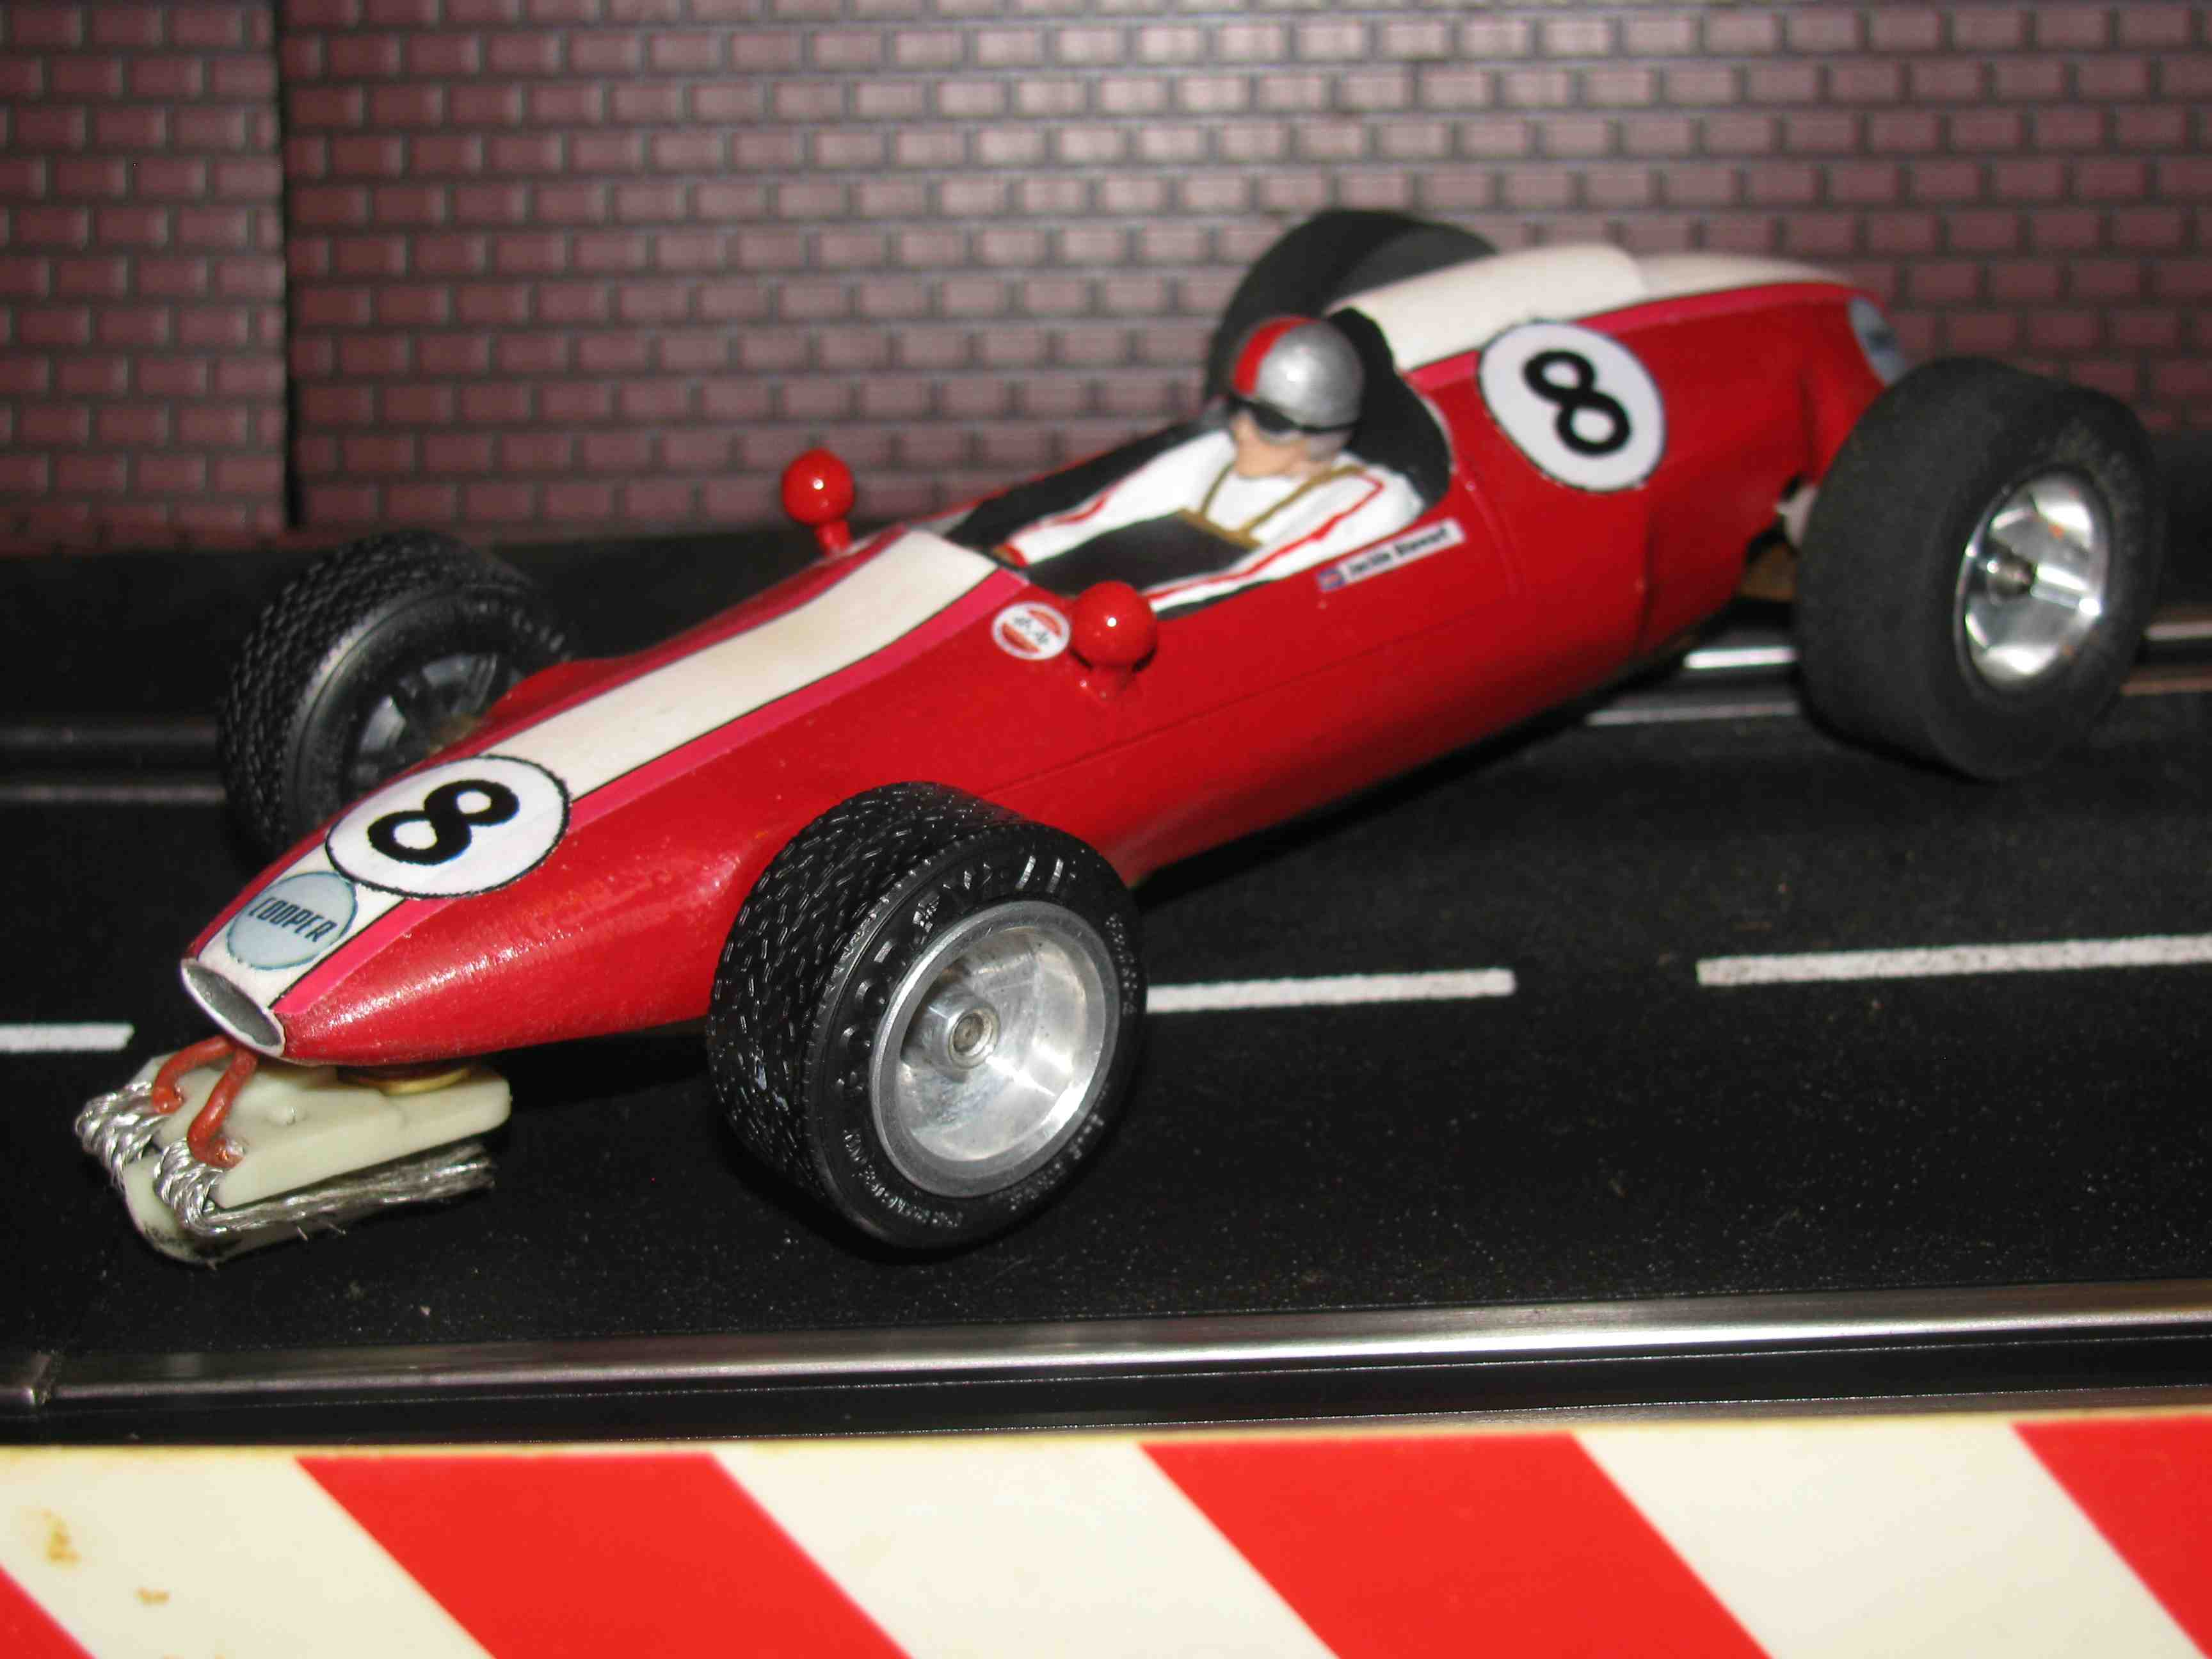 * SOLD * Vintage Russkit Cooper F1 Slot Car 1/24 Scale – Car #8